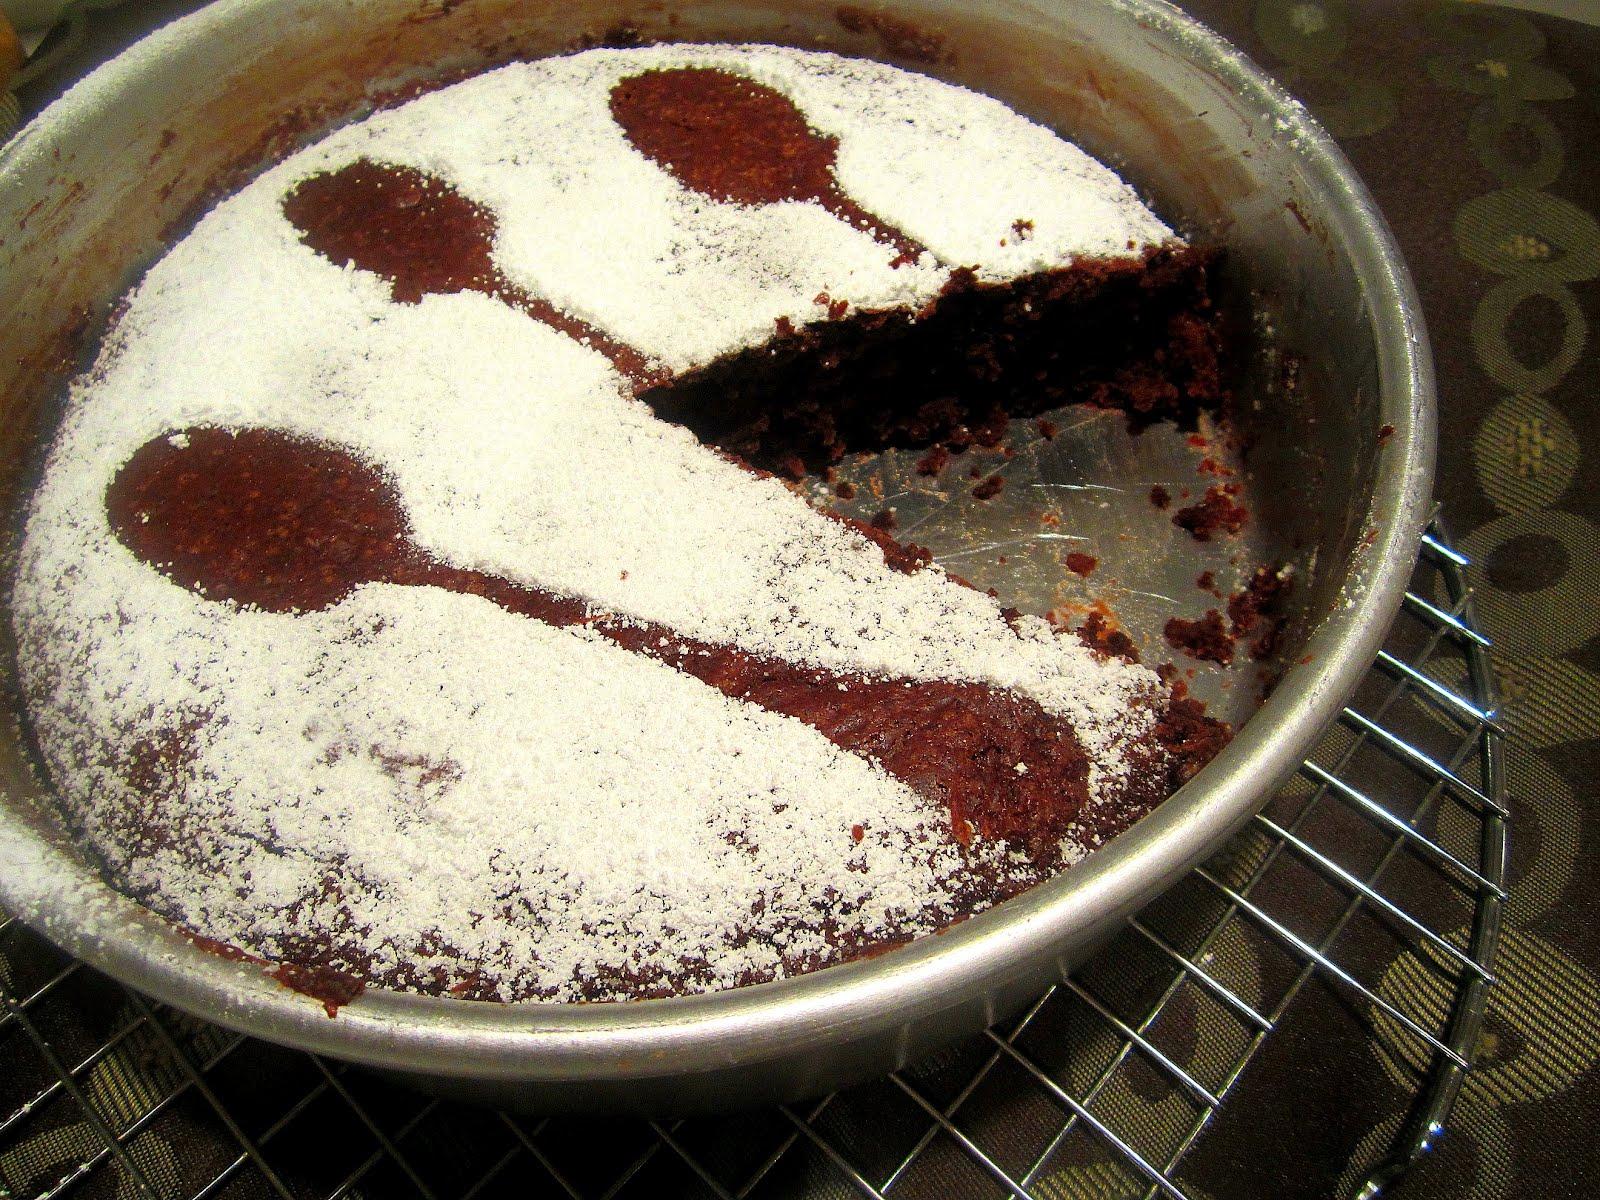 Cake Recipe King Arthur Flour: King Arthur Flour's Original Cake Pan Cake